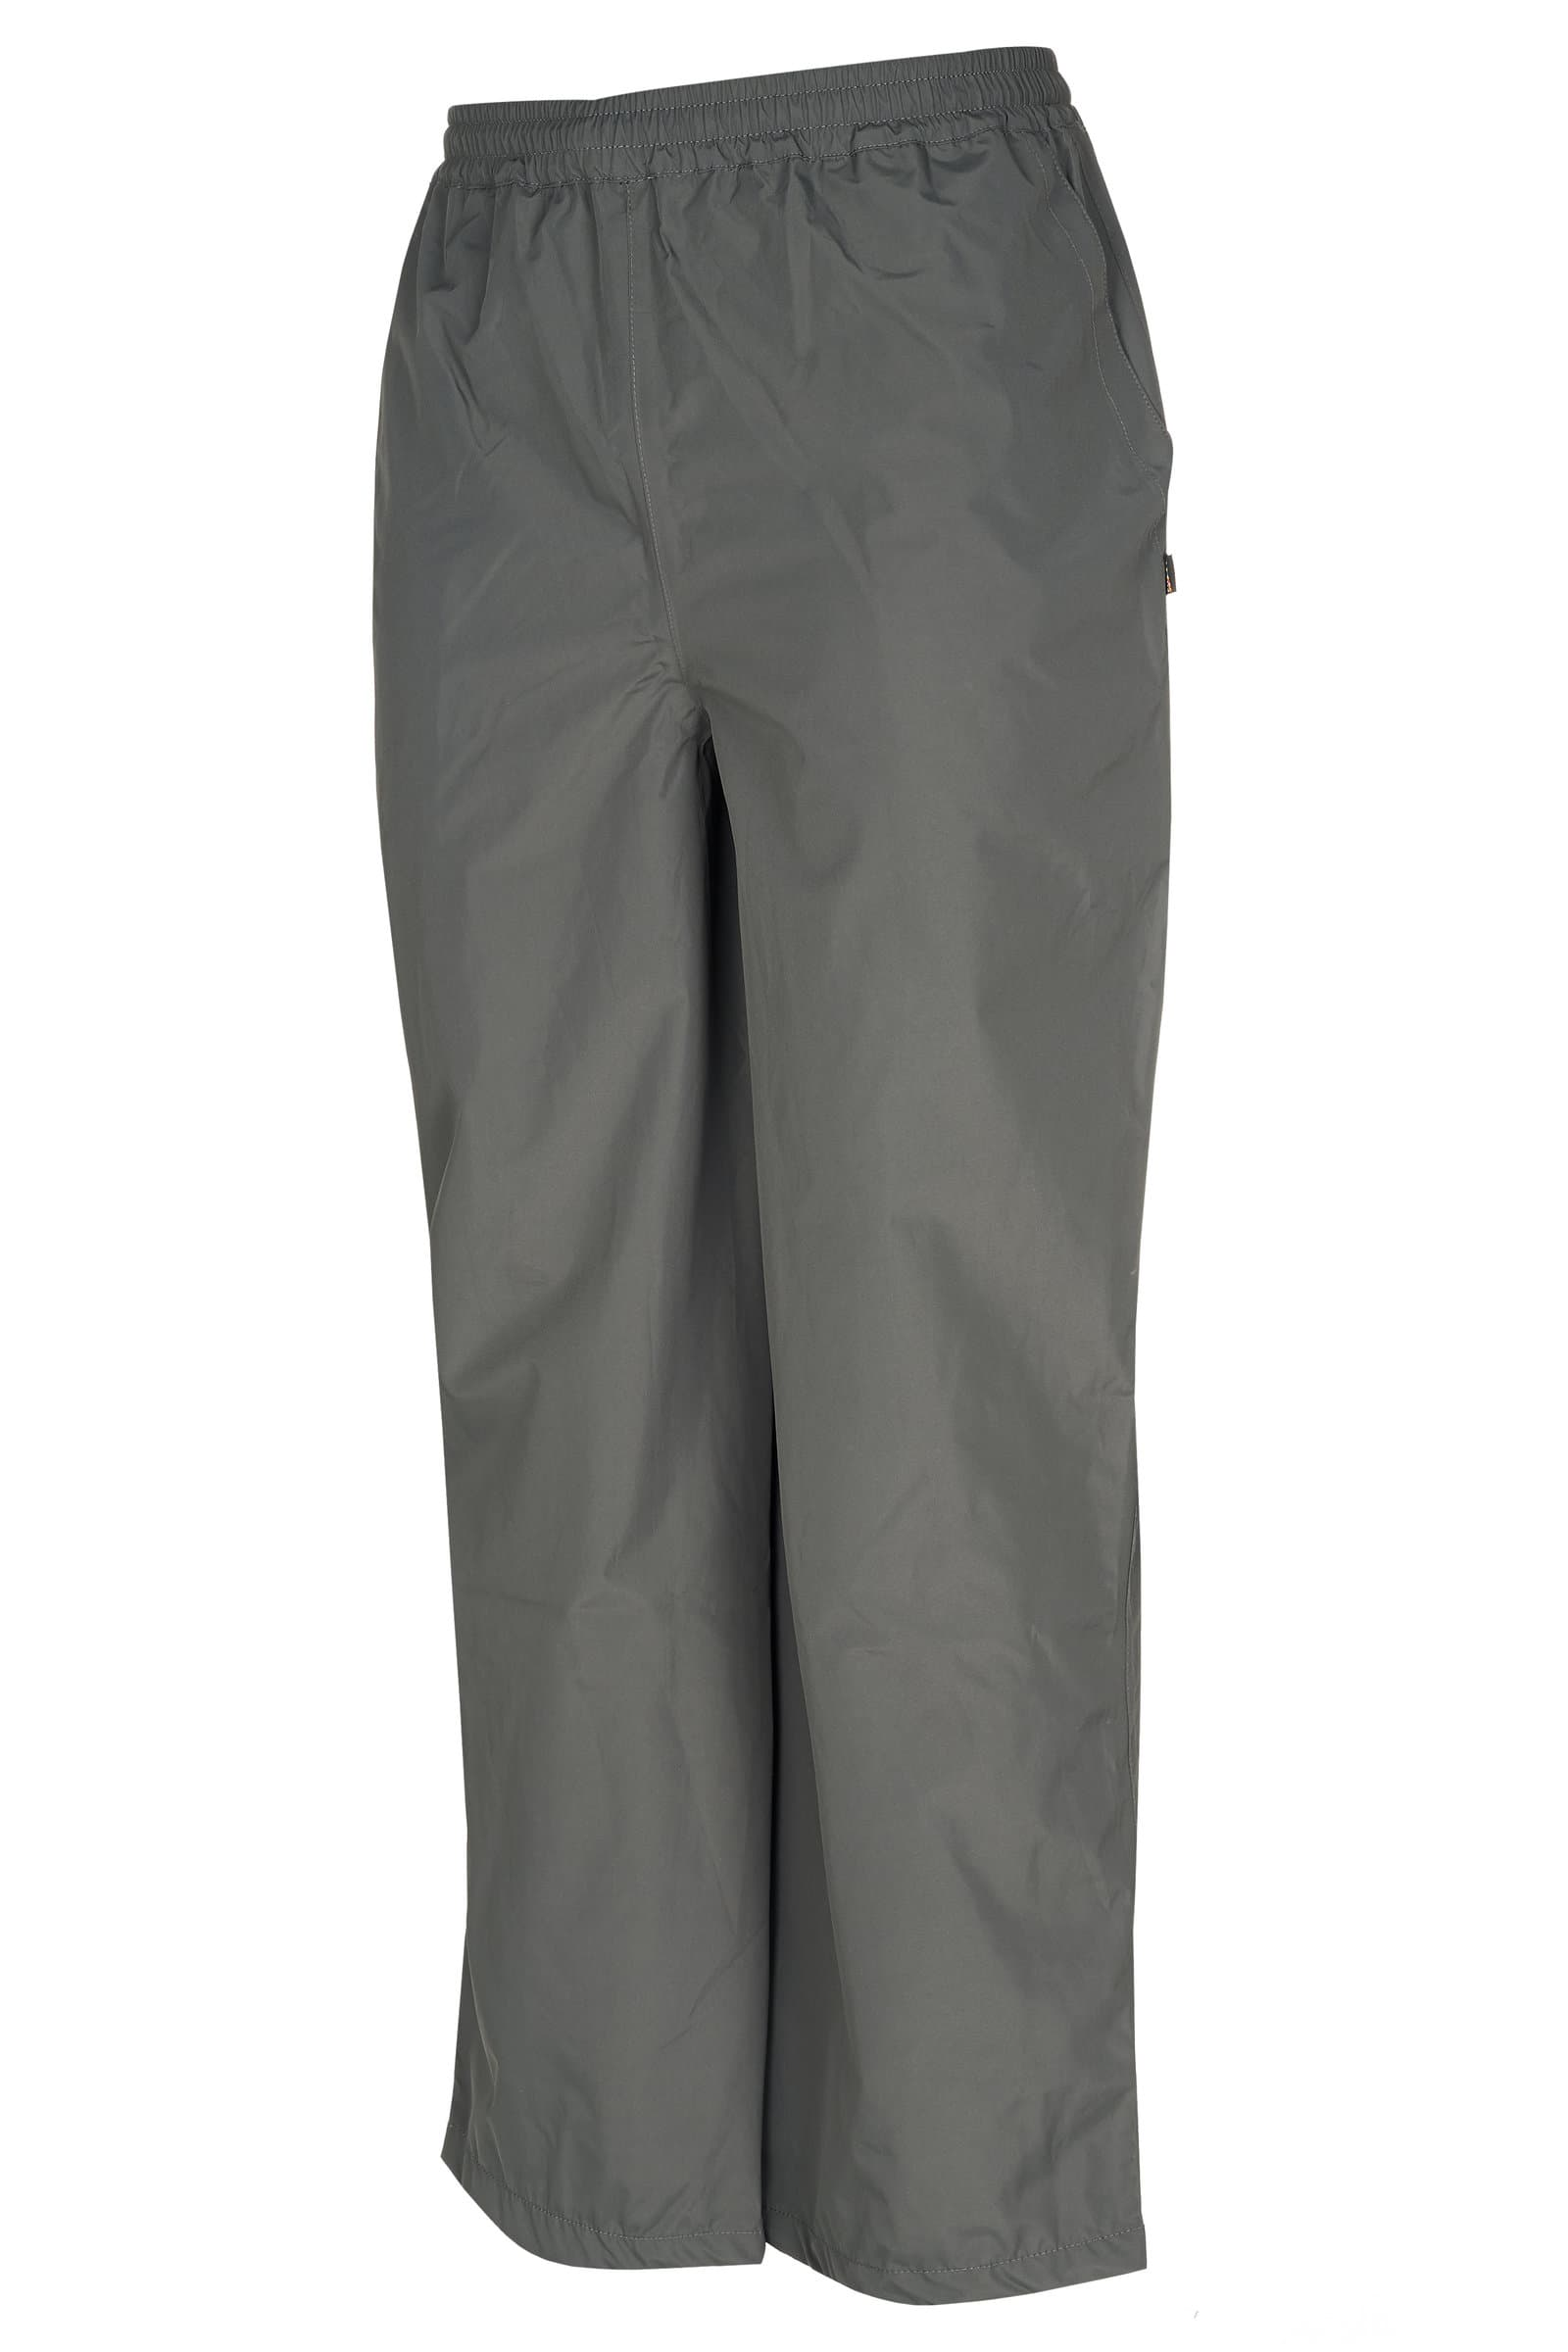 Rukka Coronado Pantalon de pluie pour homme